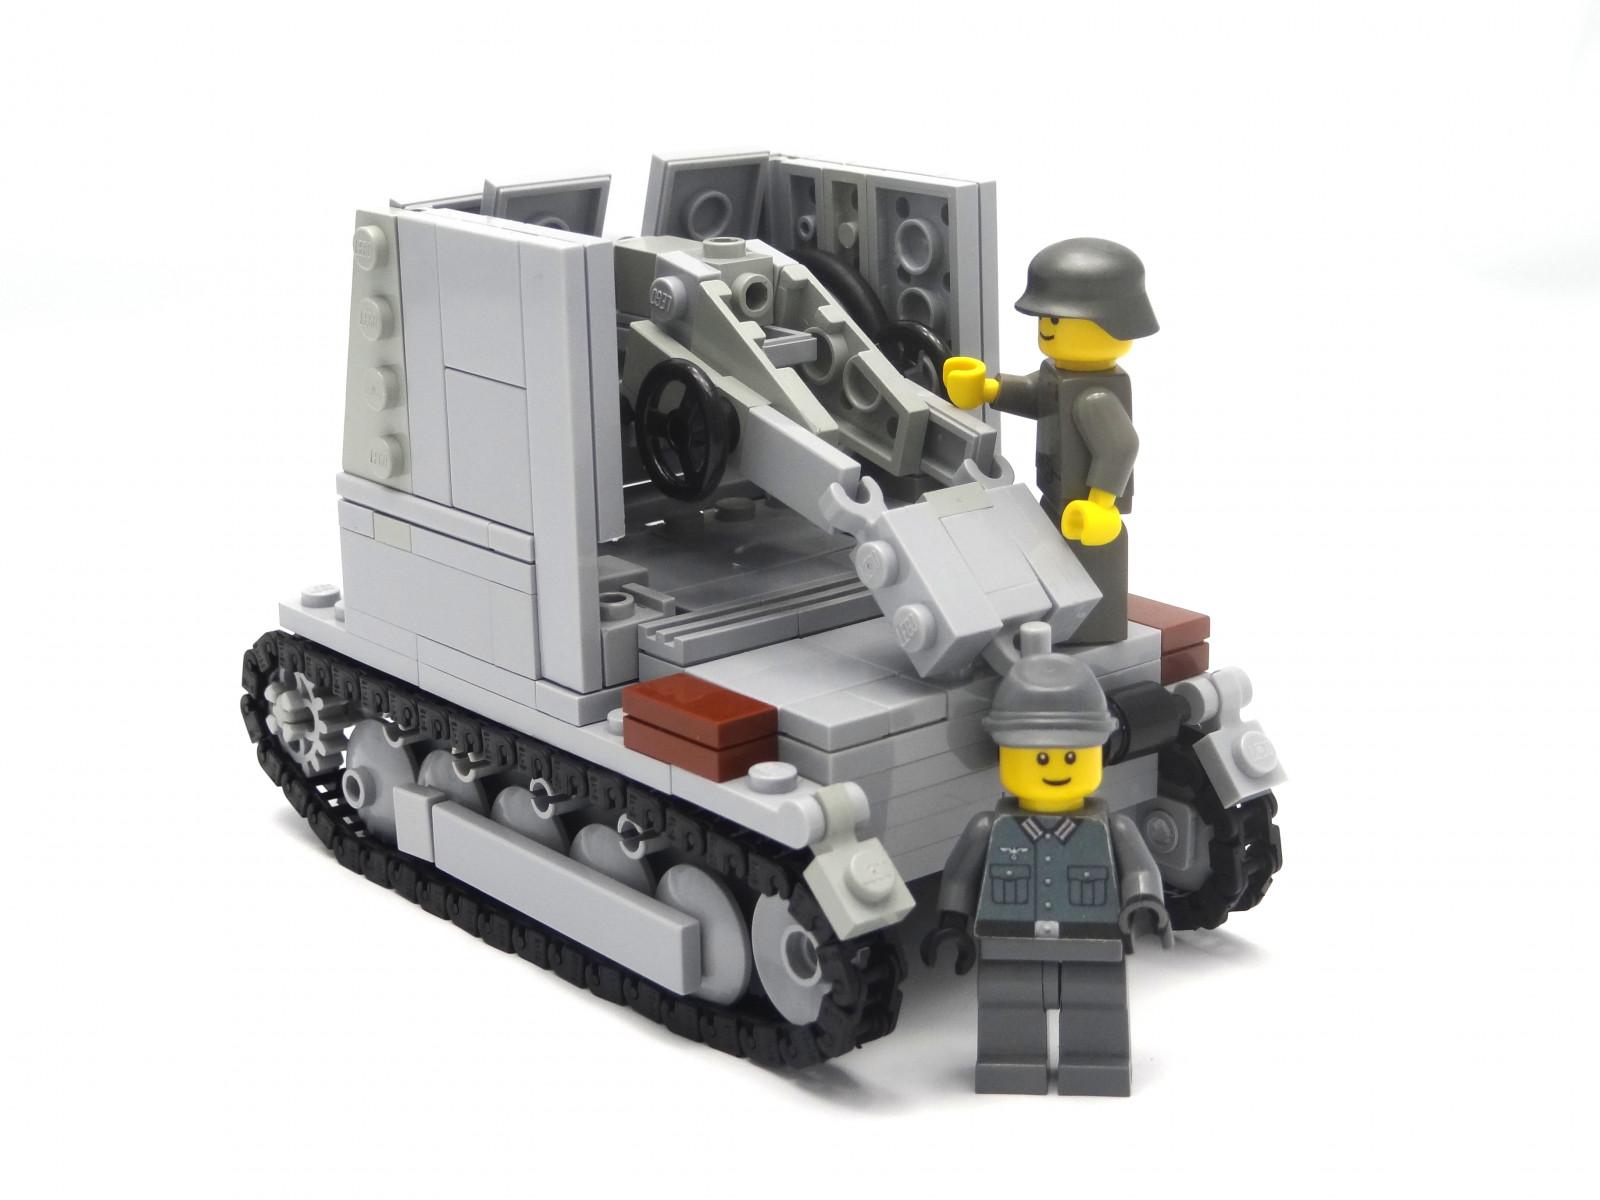 fond d 39 cran guerre r servoir lego monde jouet machine allemand ii briques v hicule. Black Bedroom Furniture Sets. Home Design Ideas